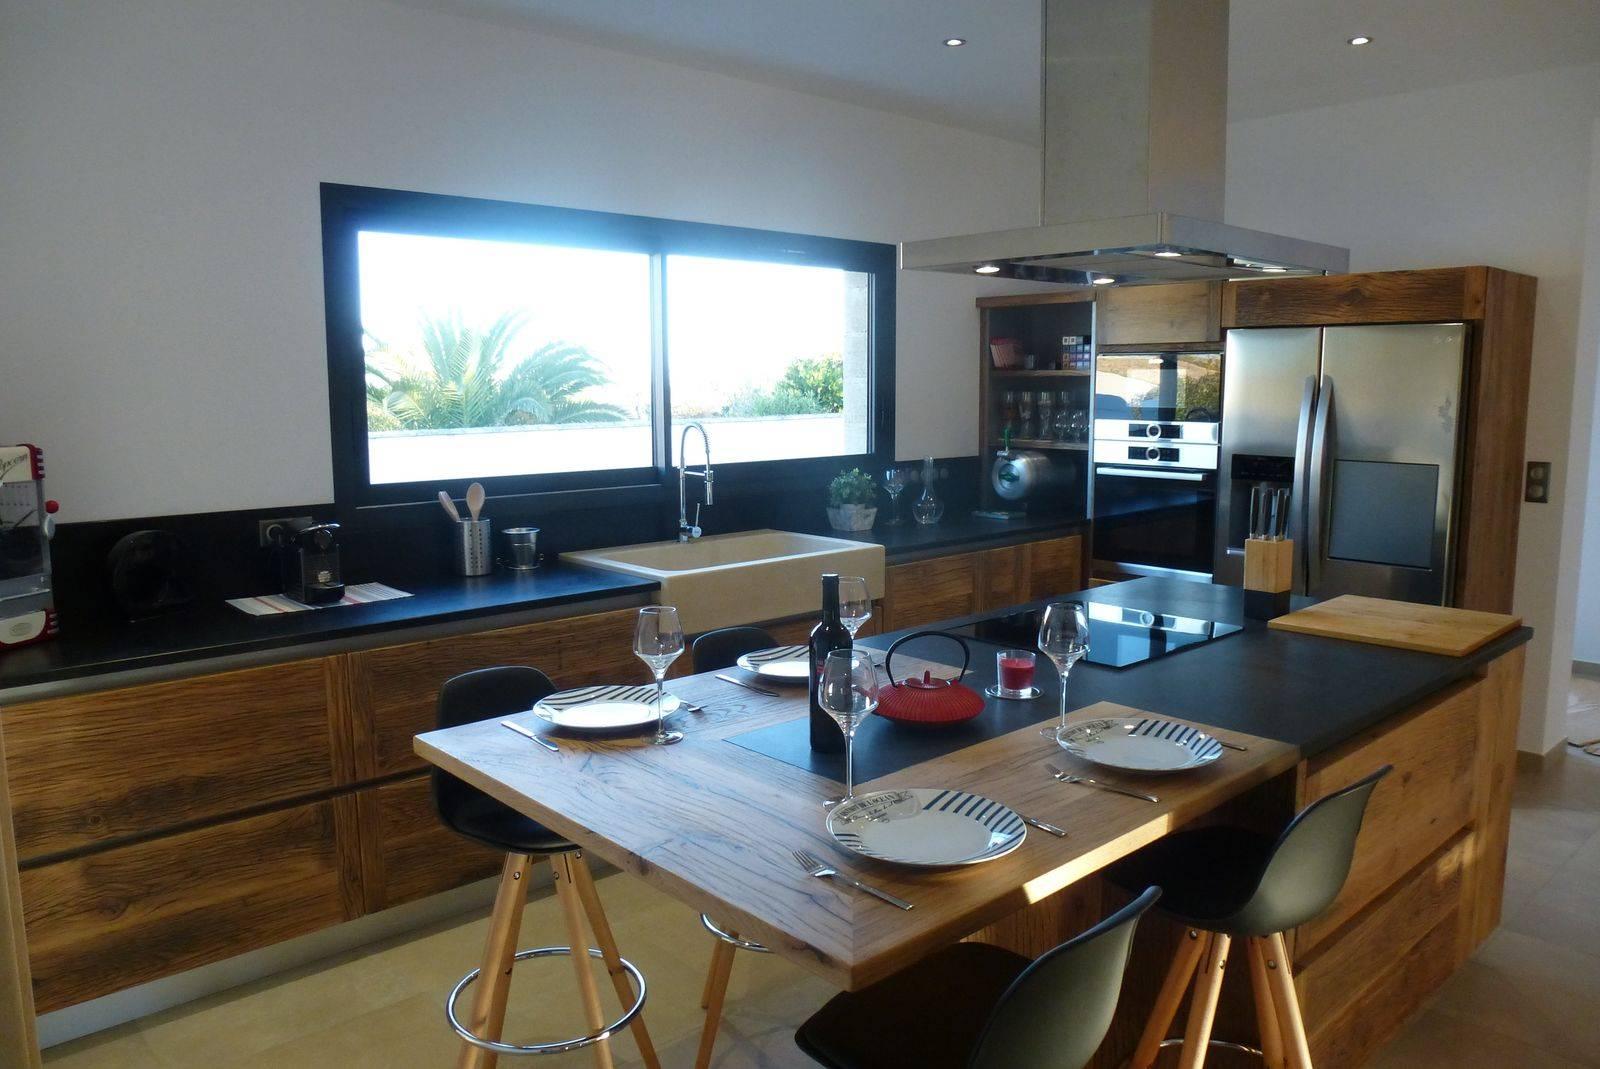 cuisine contemporaine en bois massif arles atelier. Black Bedroom Furniture Sets. Home Design Ideas